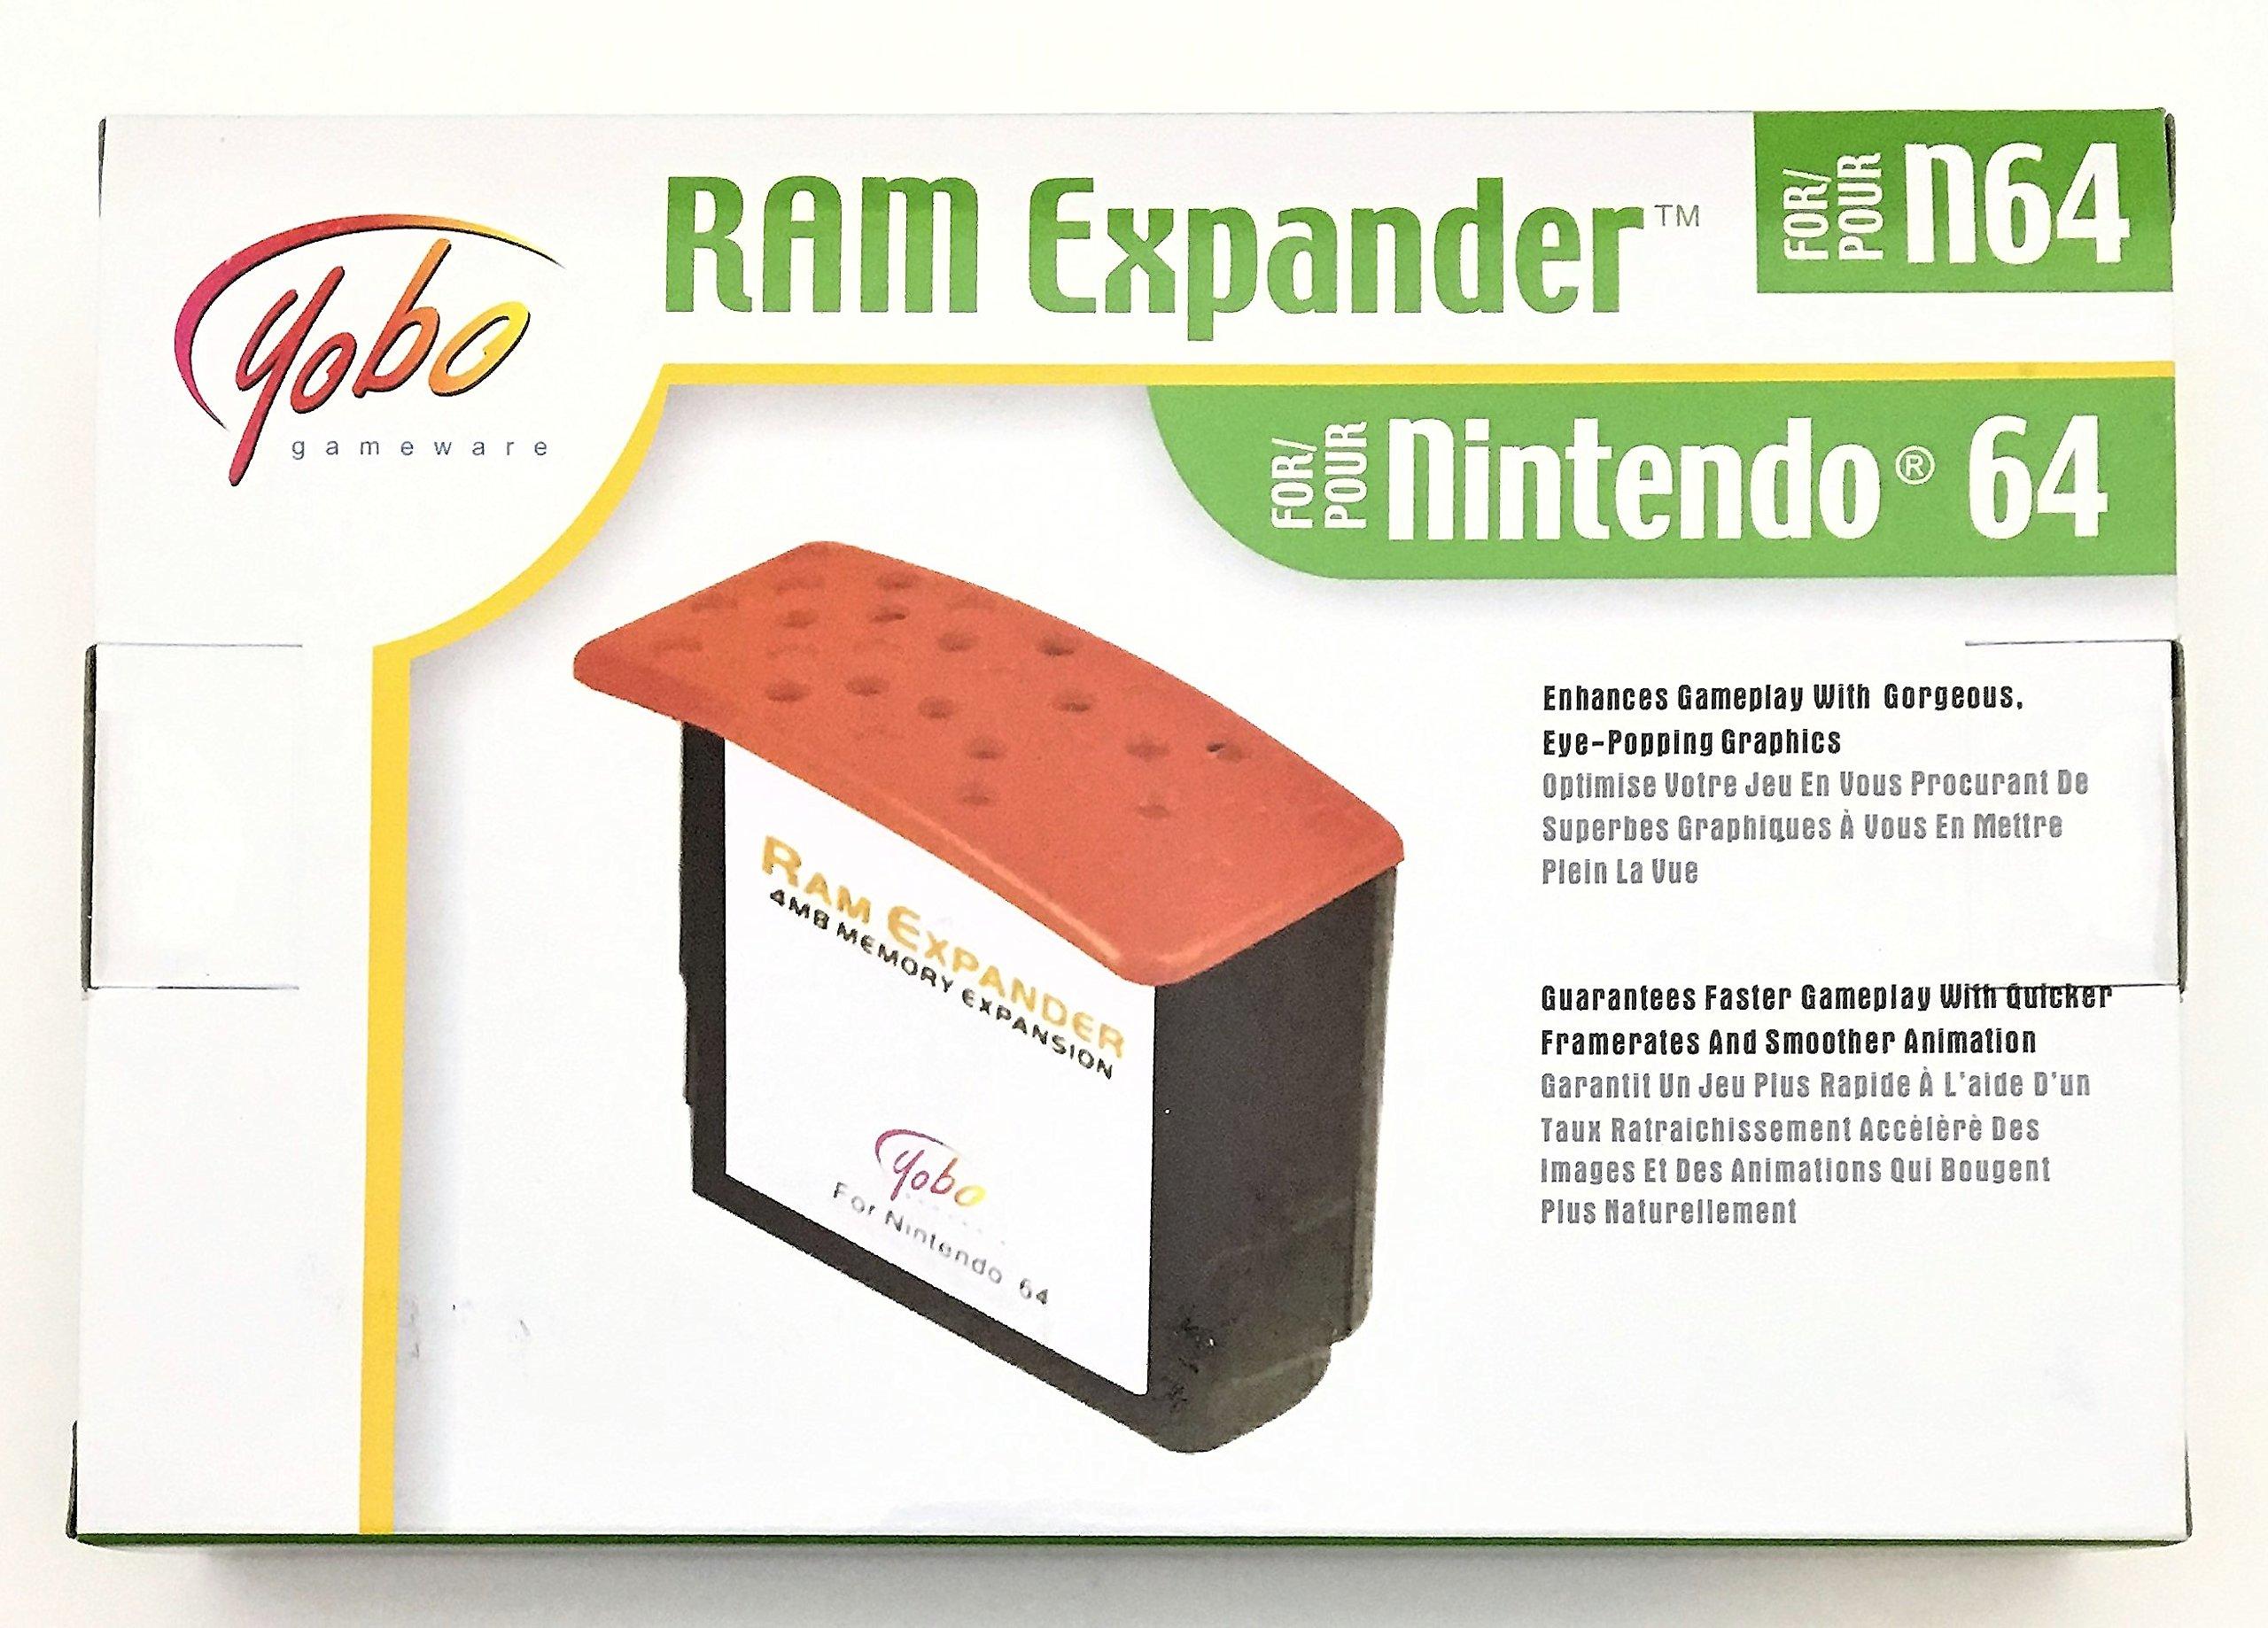 N64 RAM Expander - Expansion Pak Upgrade for Nintendo 64